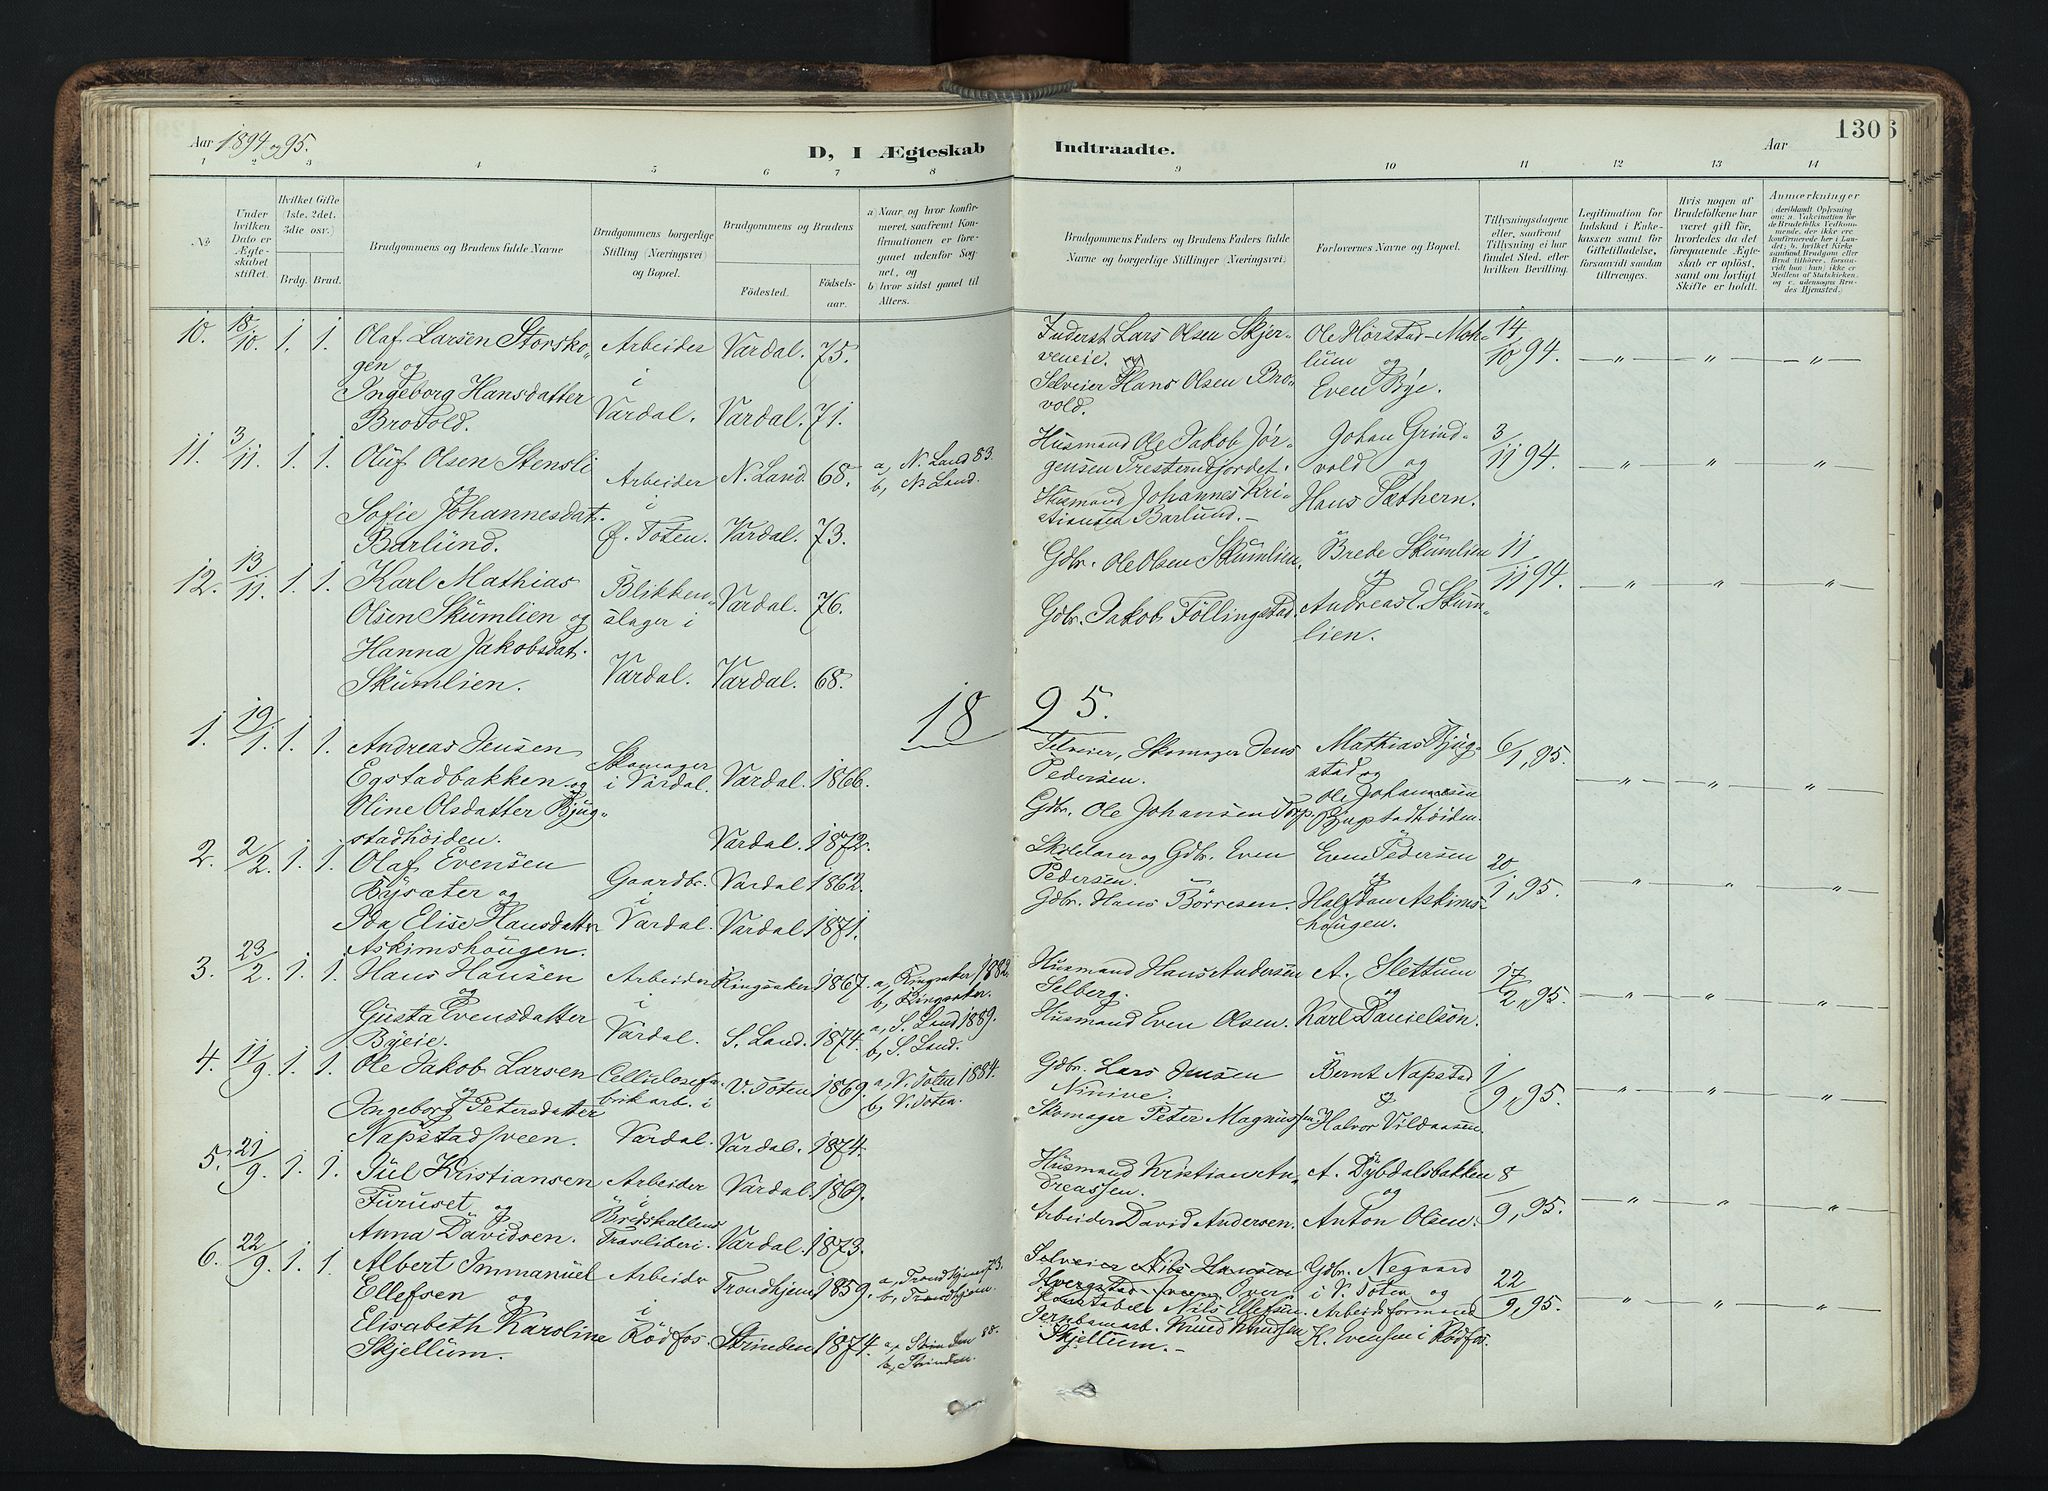 SAH, Vardal prestekontor, H/Ha/Haa/L0019: Ministerialbok nr. 19, 1893-1907, s. 130